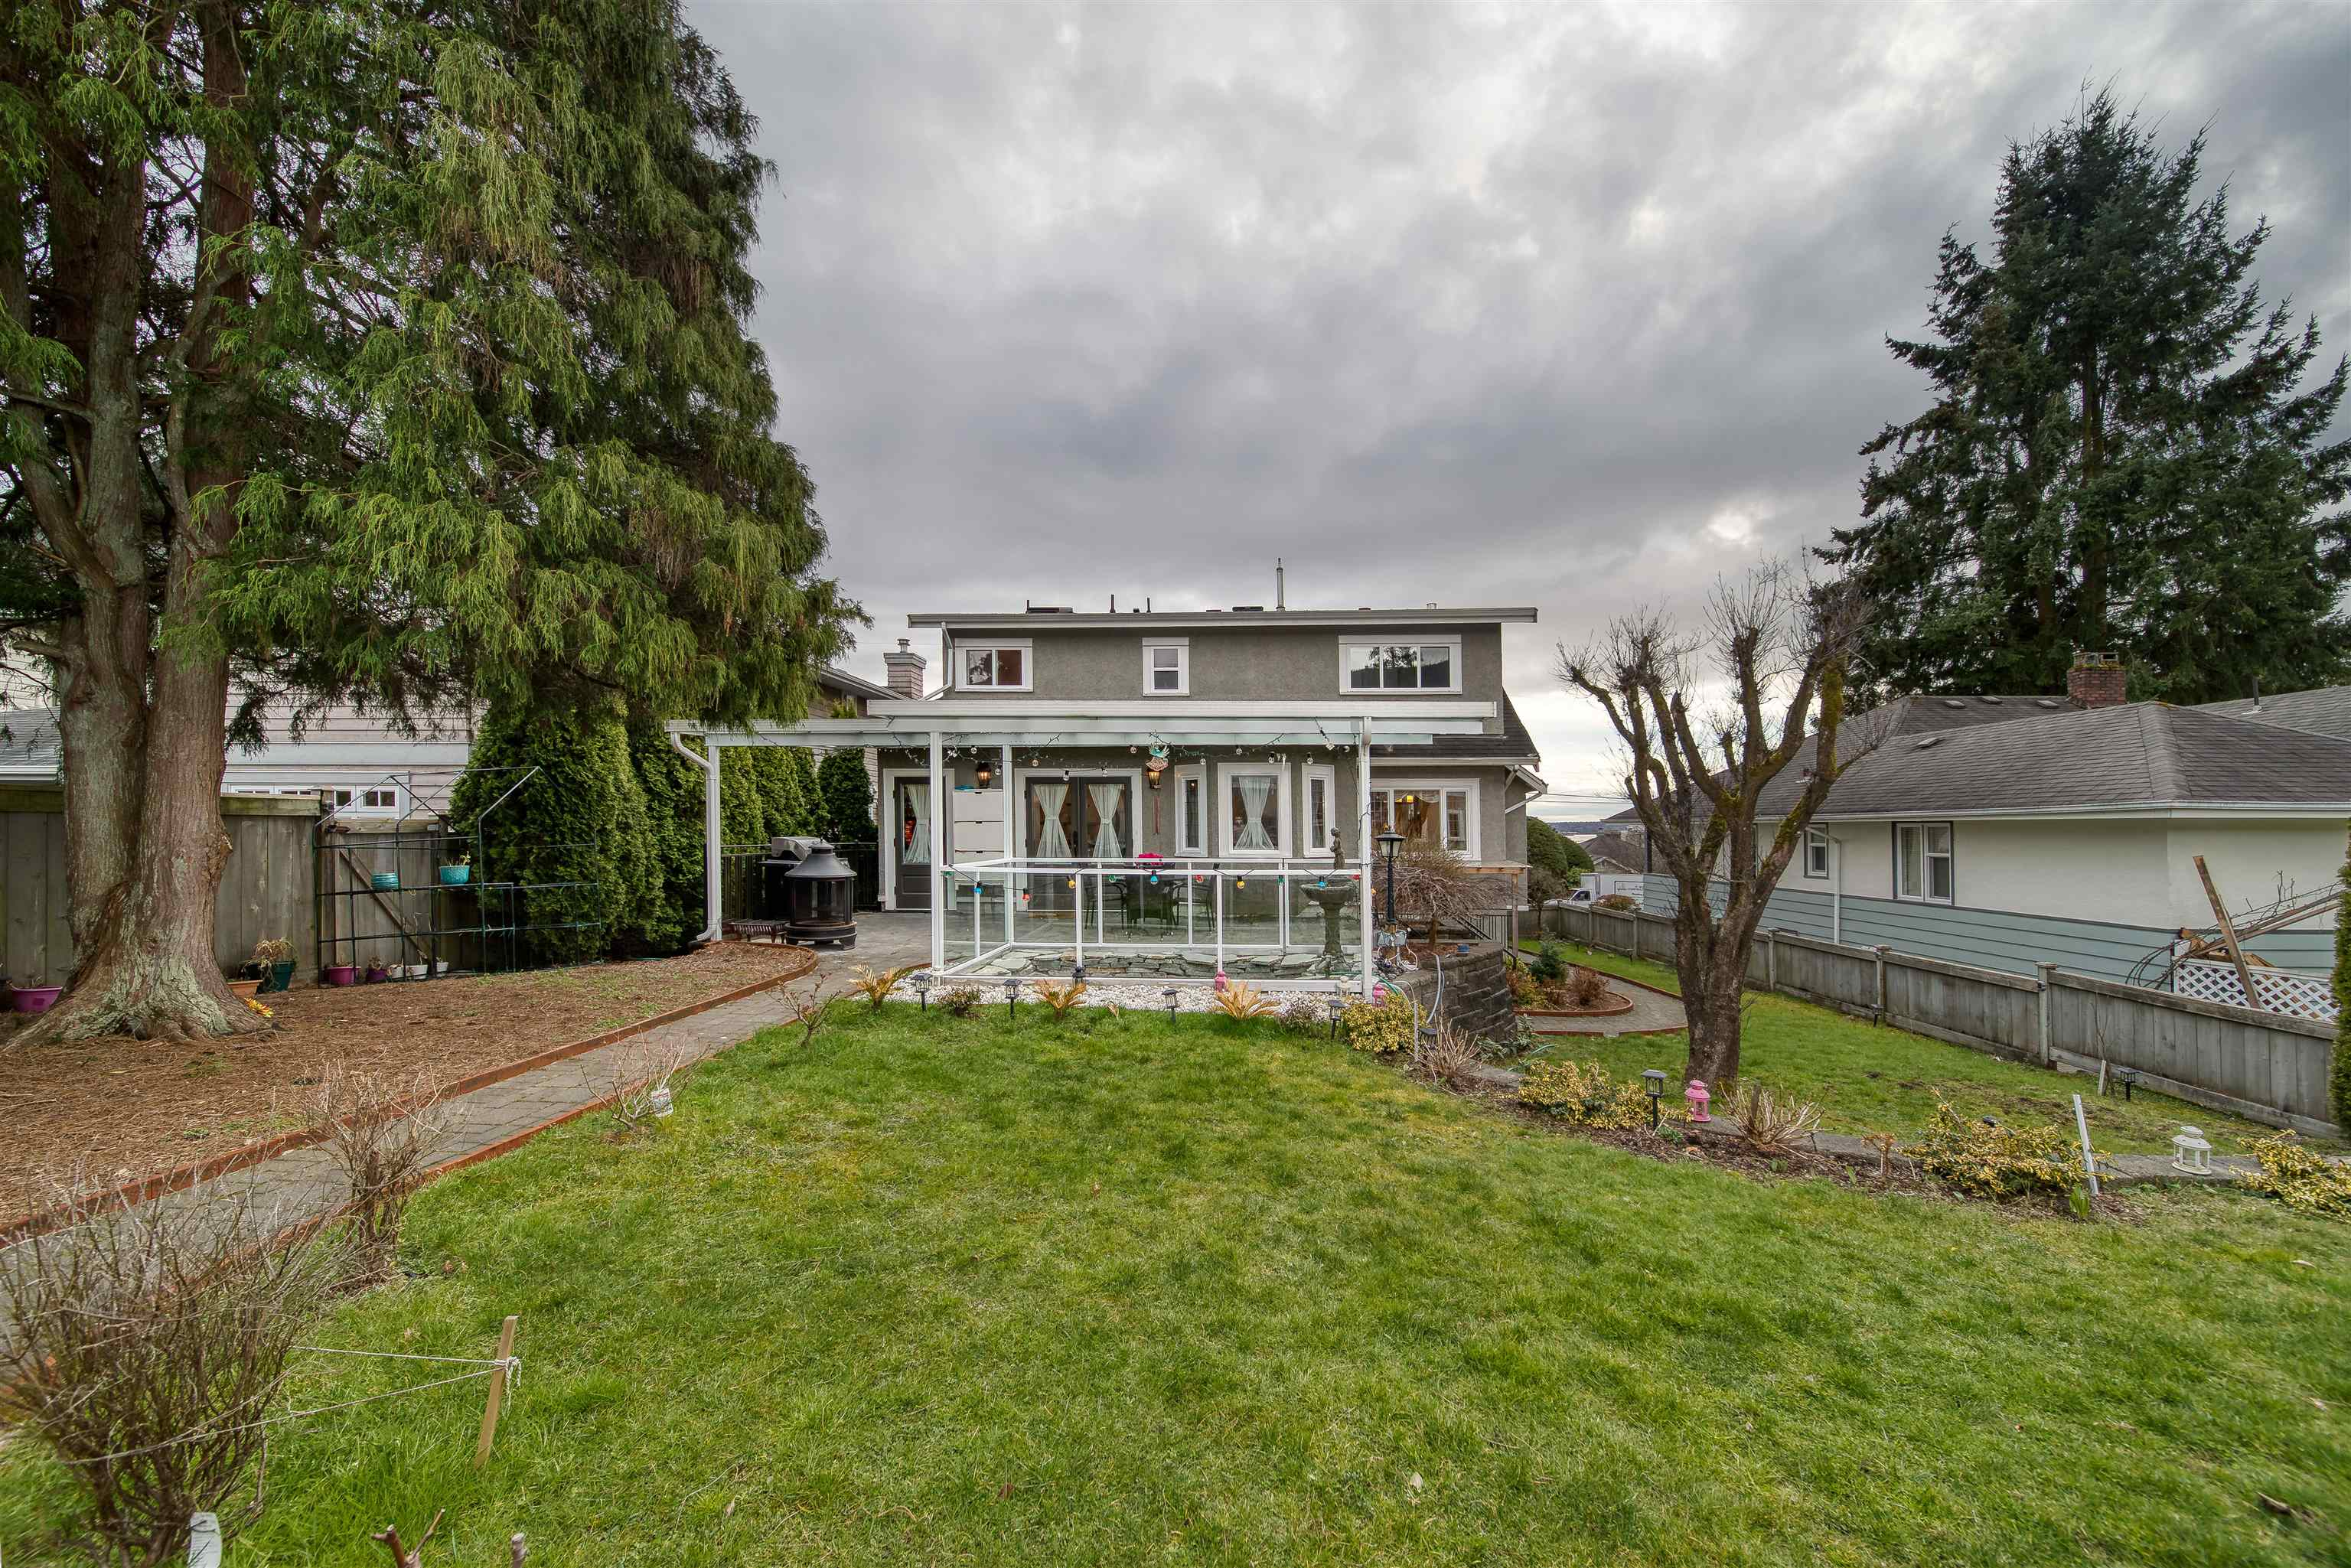 1357 FULTON AVENUE - Ambleside House/Single Family for sale, 6 Bedrooms (R2617731) - #3